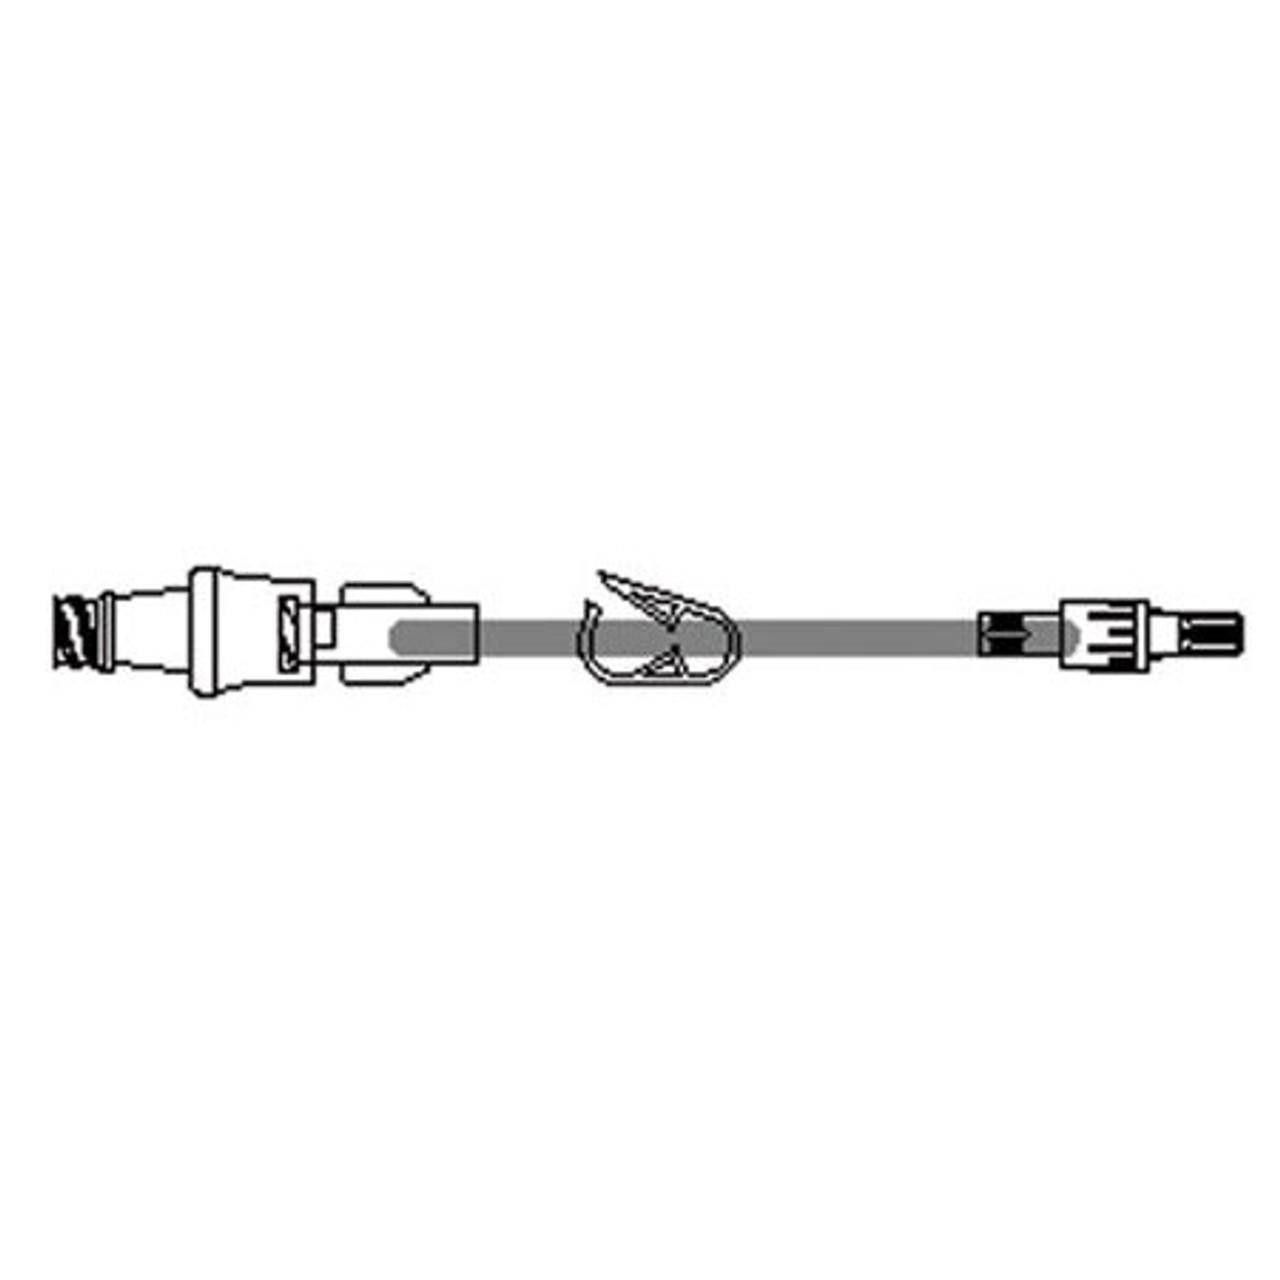 Extension Set / Saline Lock by ICU Medical